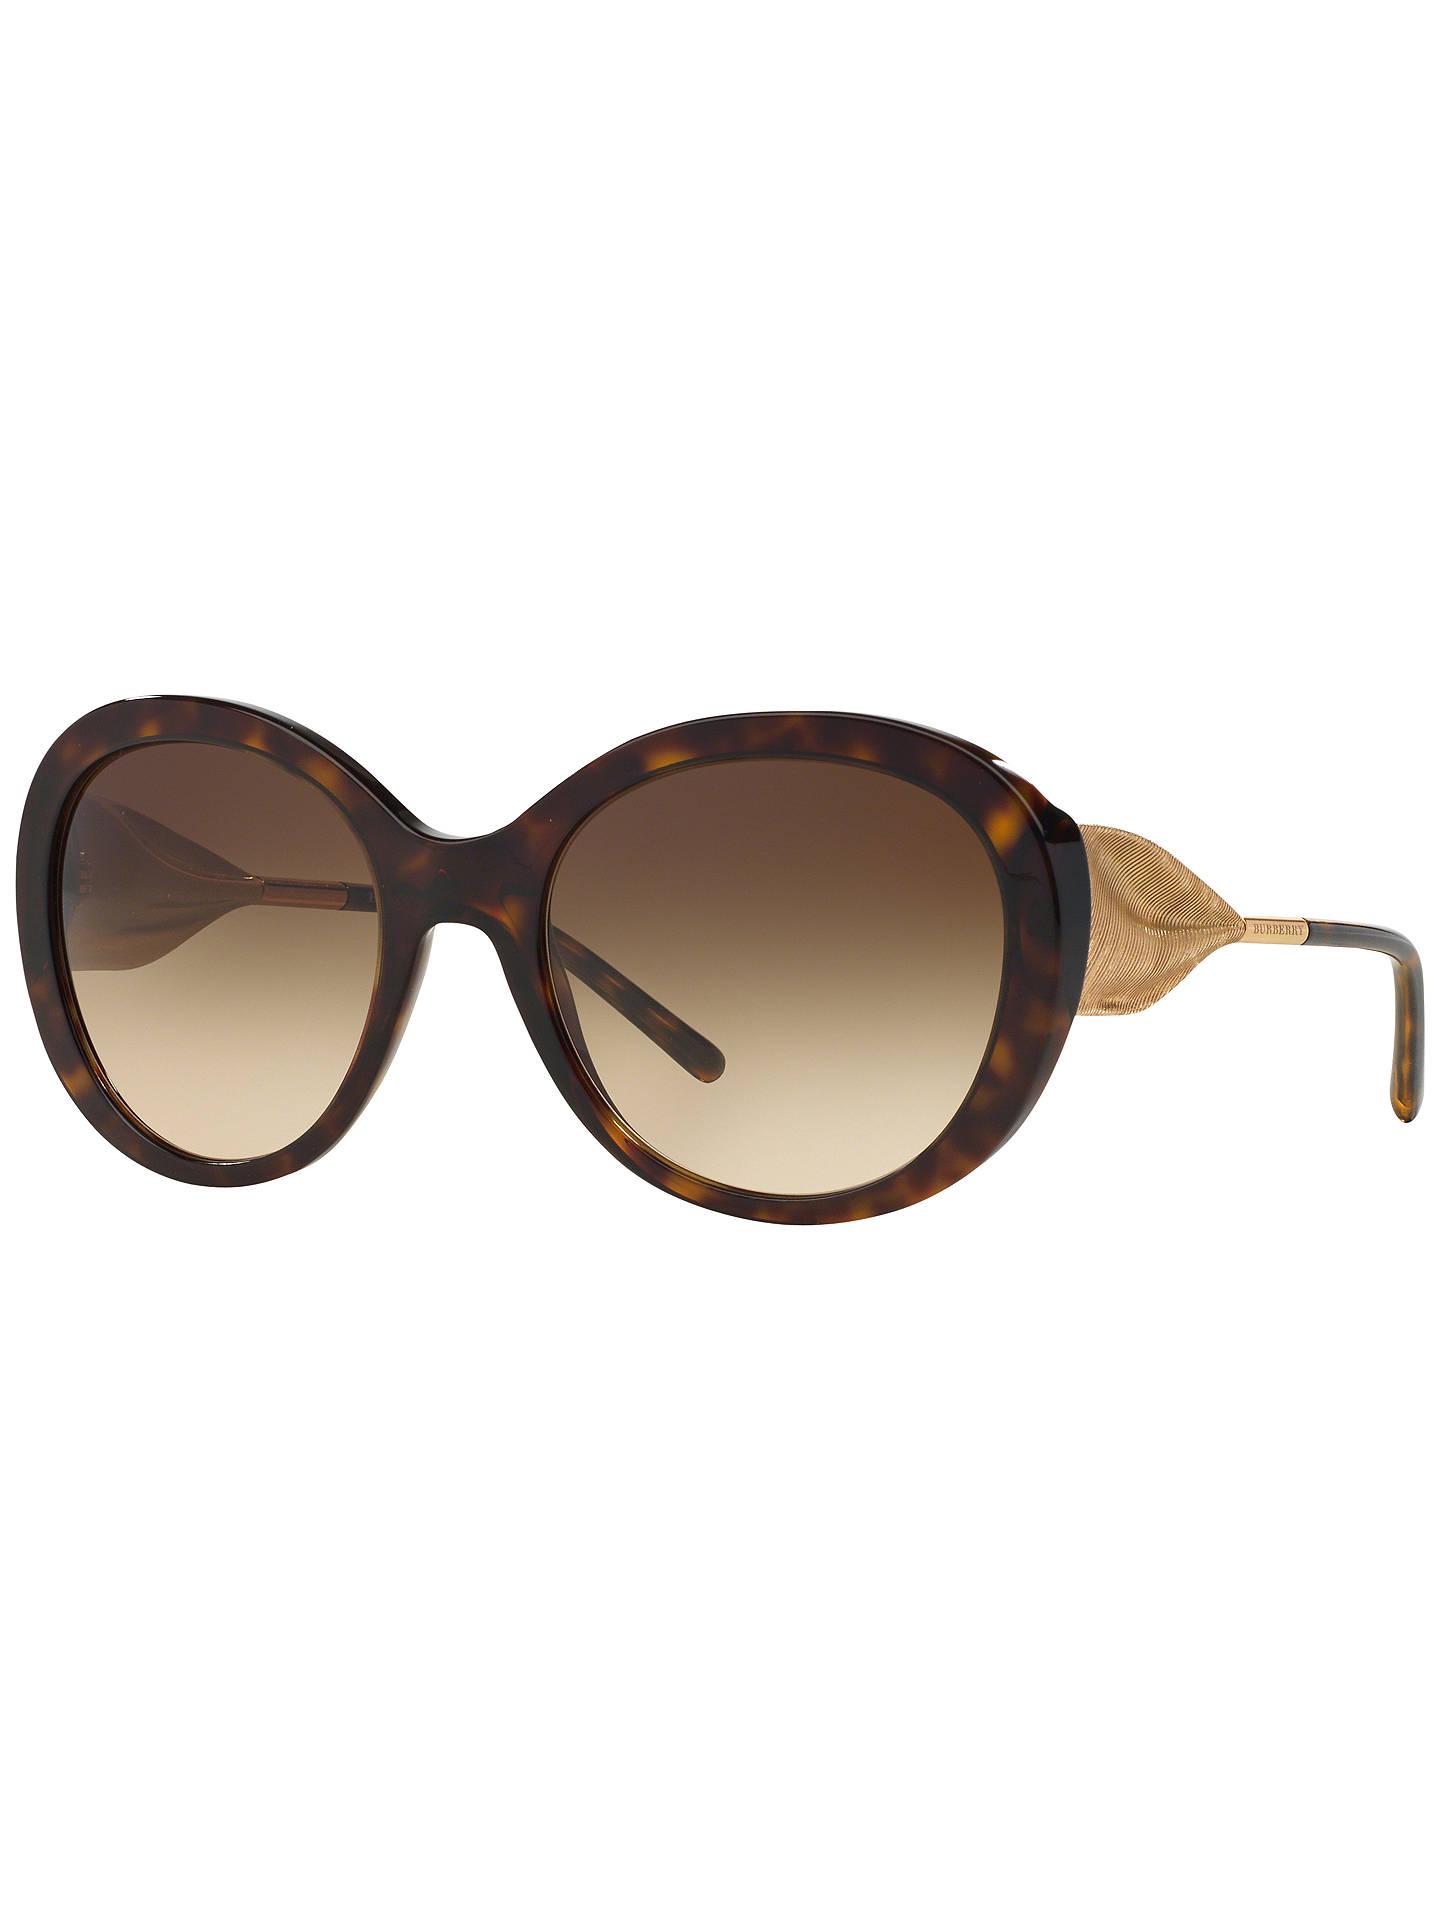 03ae2011909 Buy Burberry BE4191 Round Sunglasses